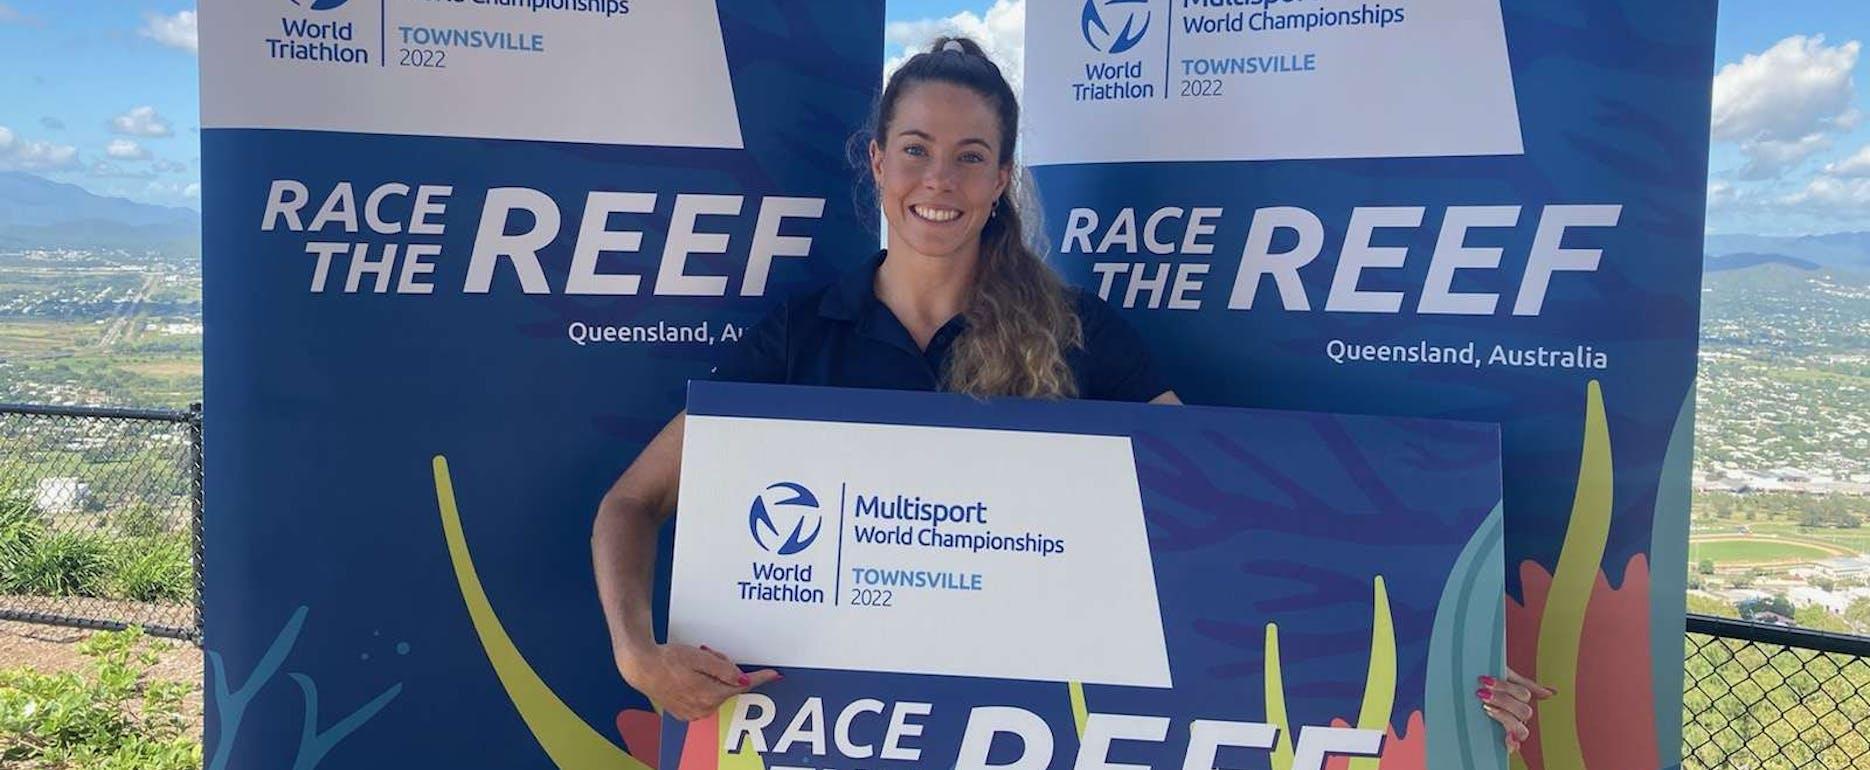 Australian professional triathlete Ellie Salthouse